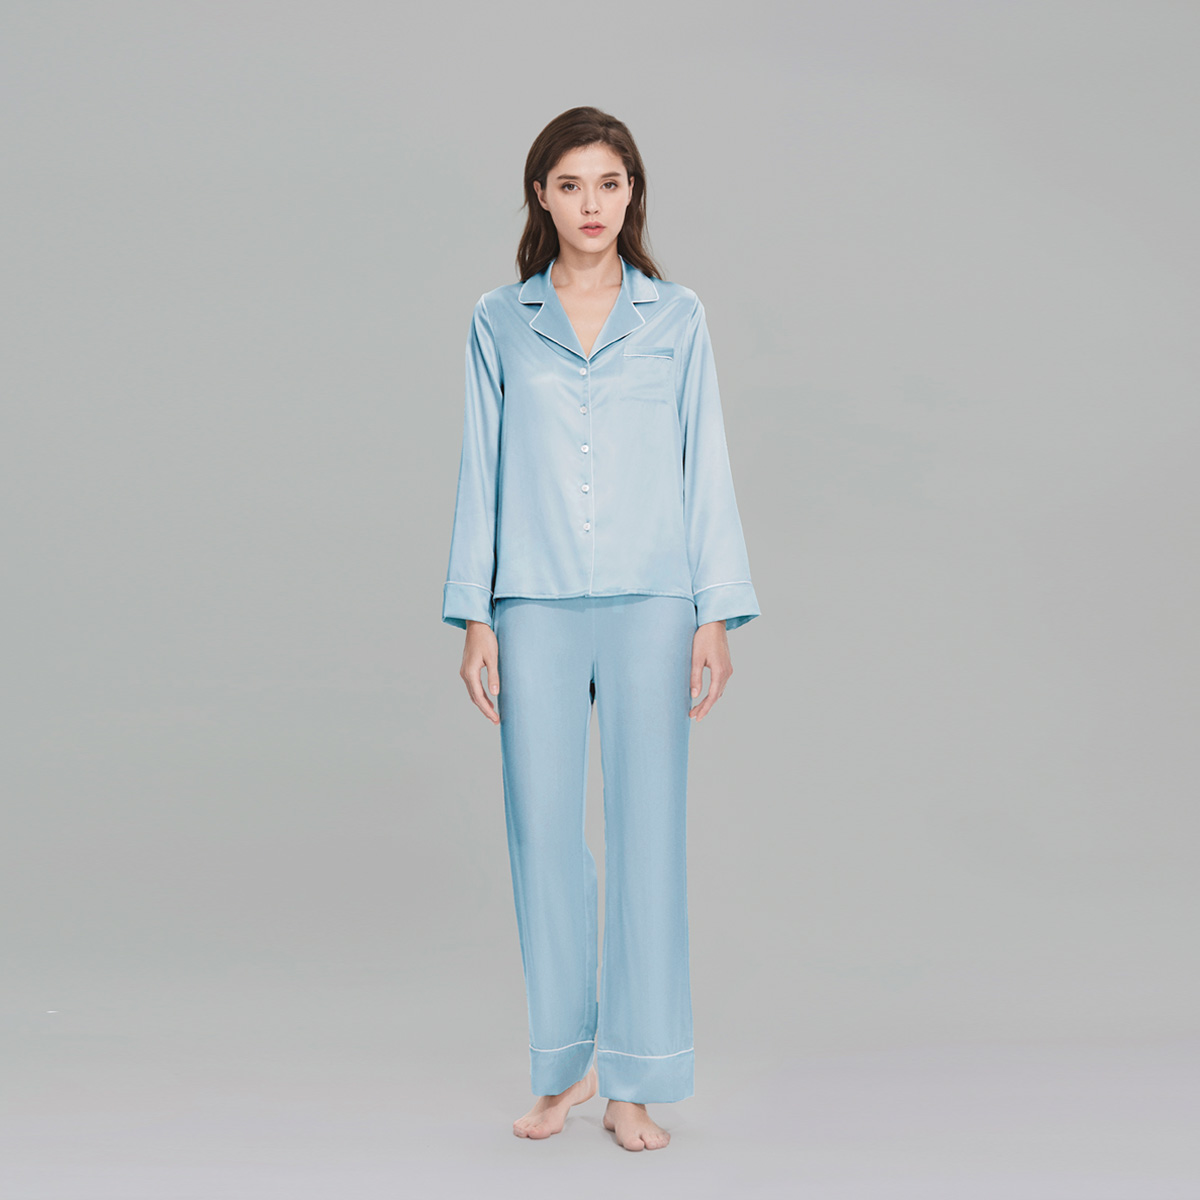 Classic睡衣套装